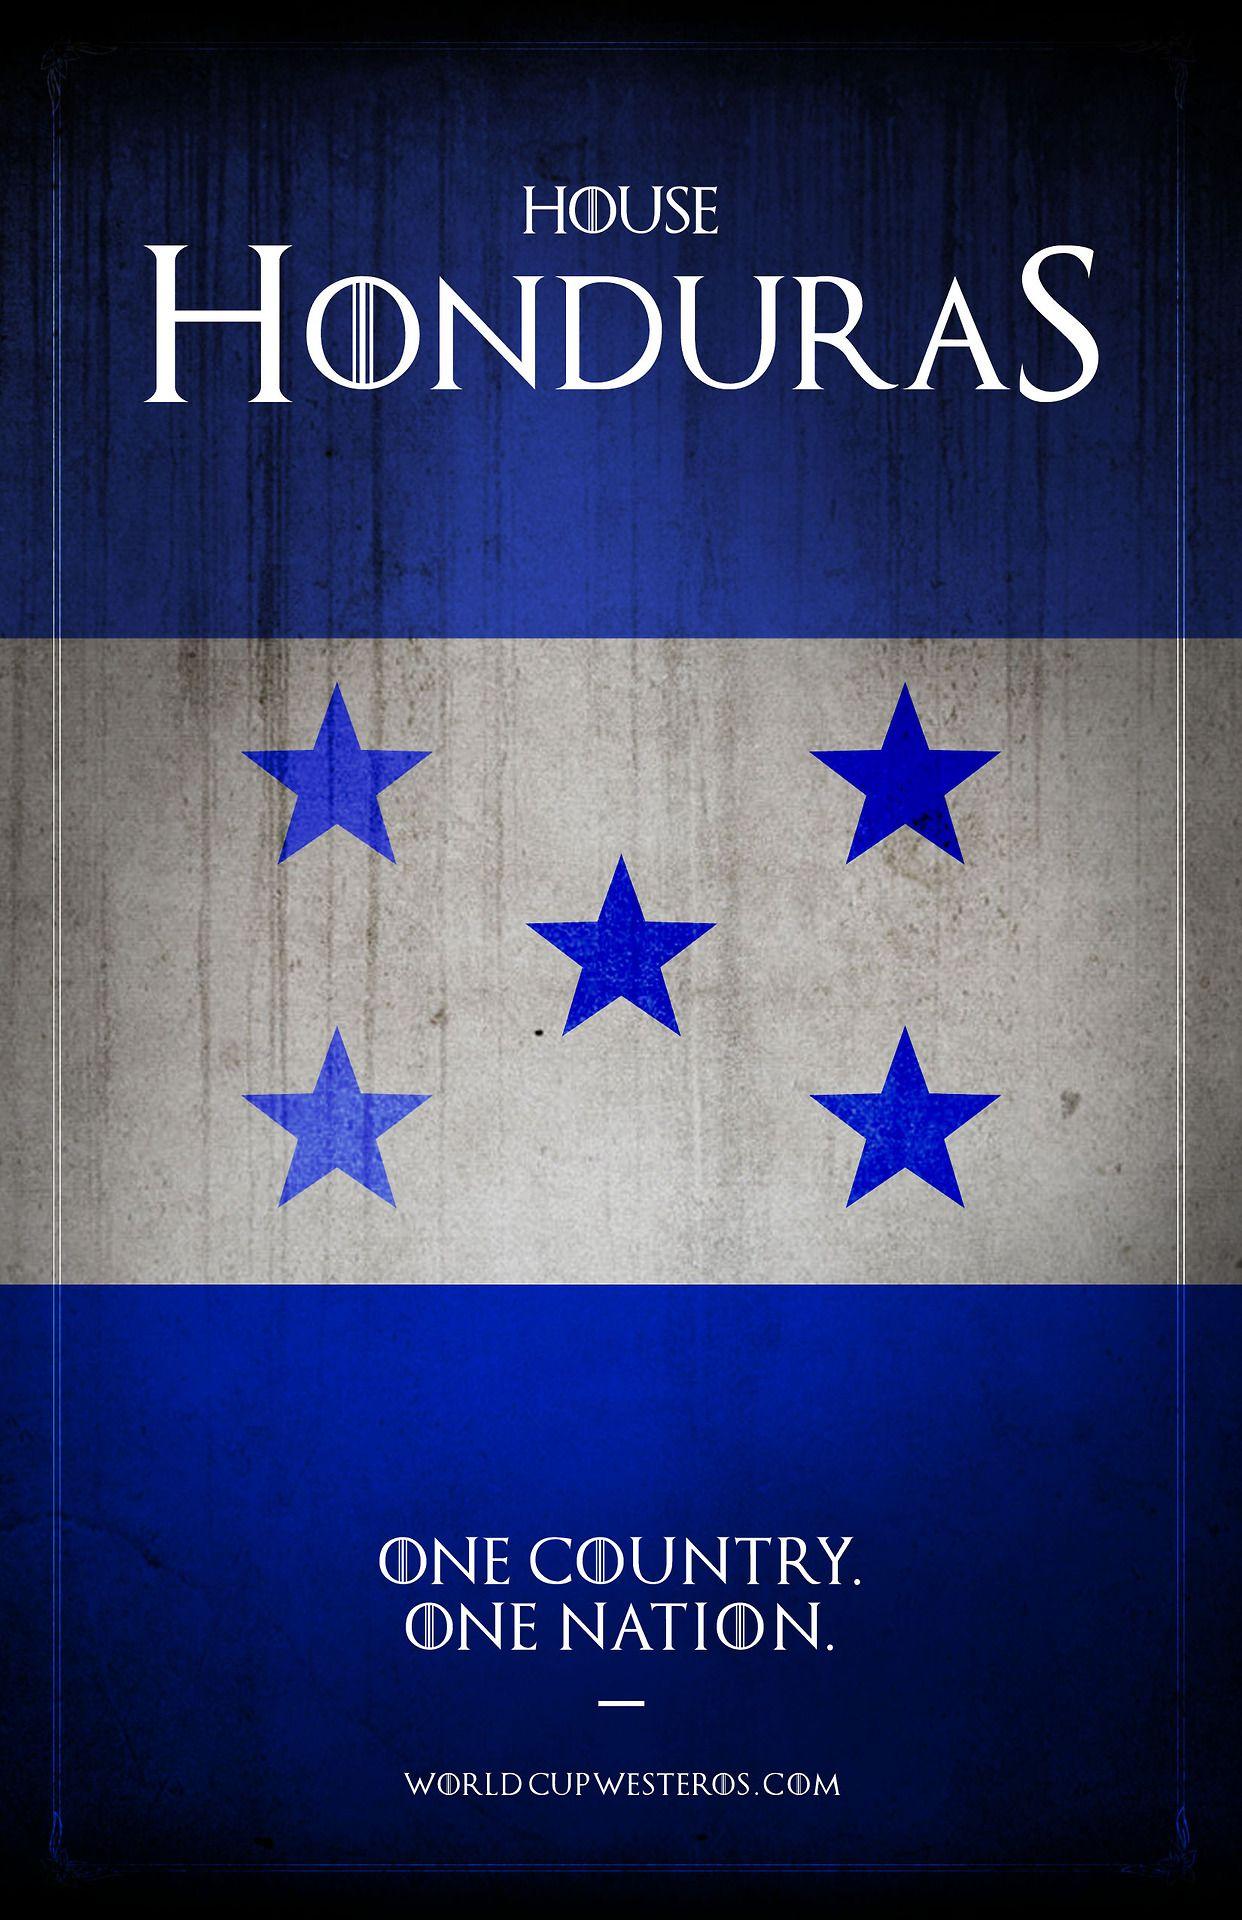 #GameofThrones House Honduras